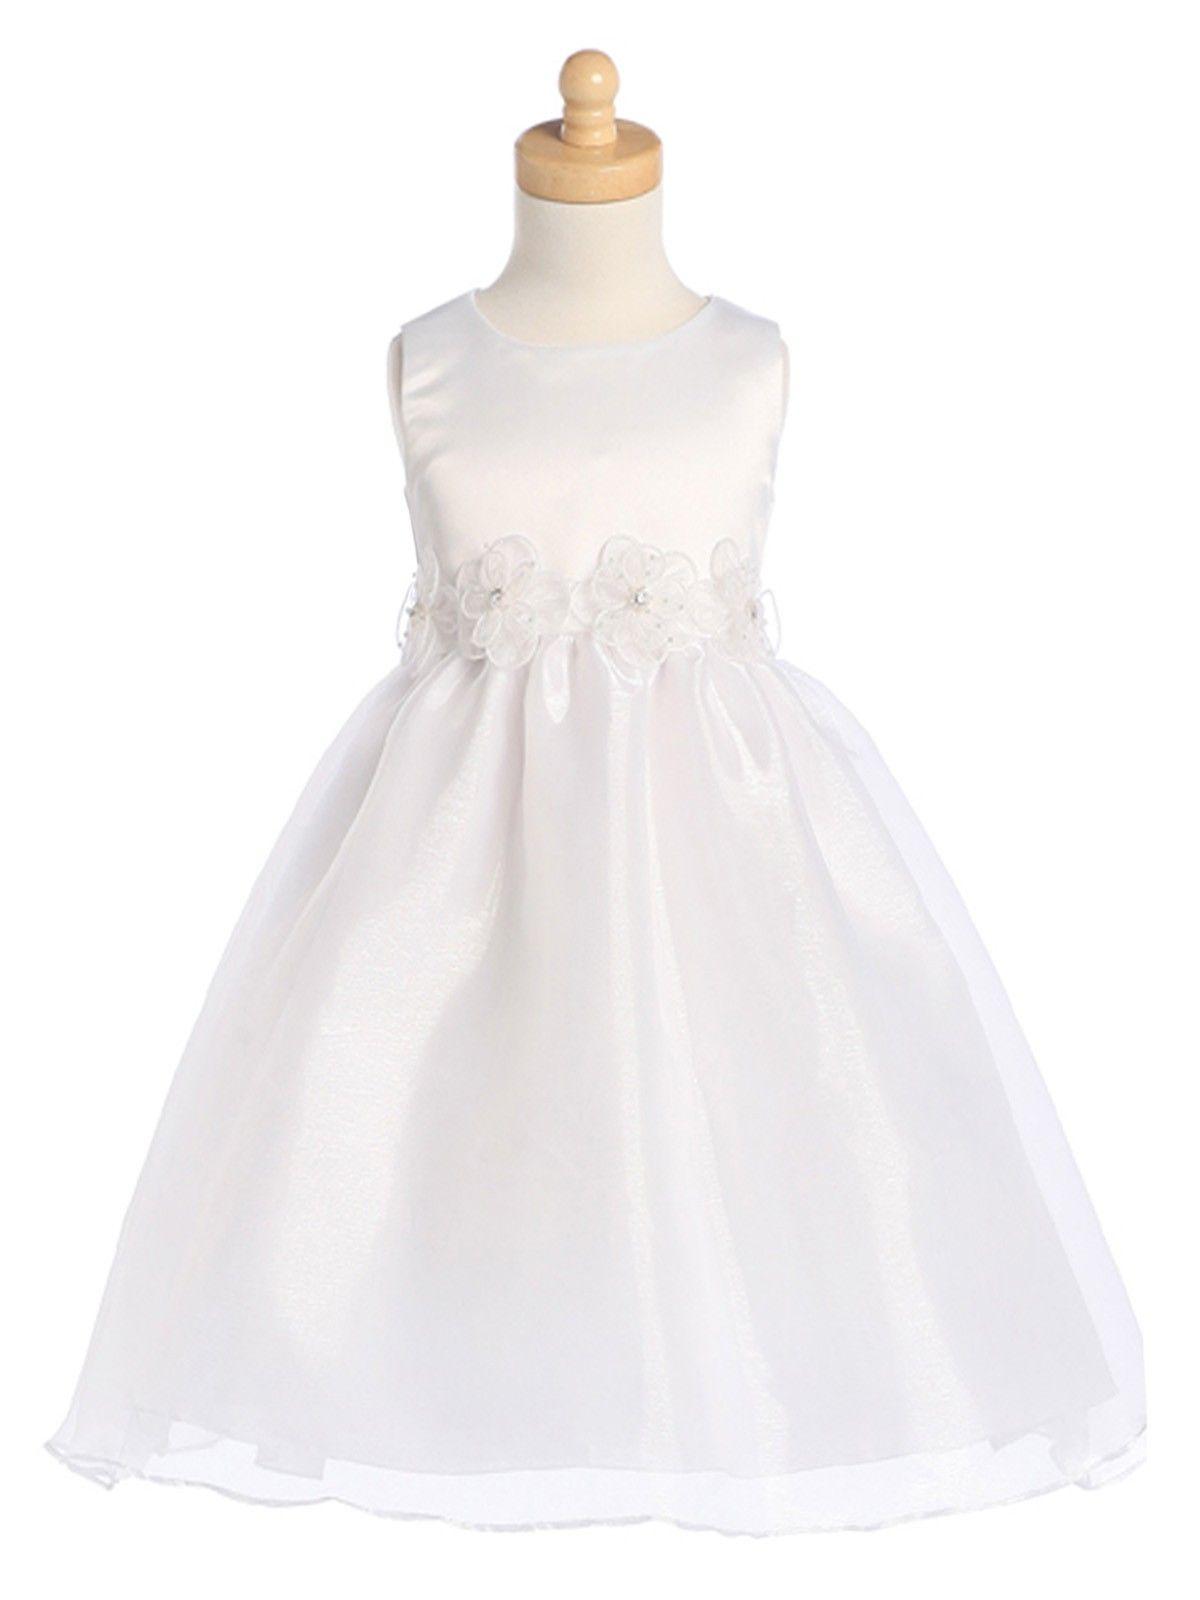 668e86f78c Marmellata Rose Flower Girl Dress – Girls 7-14 found at  JCPenney ...